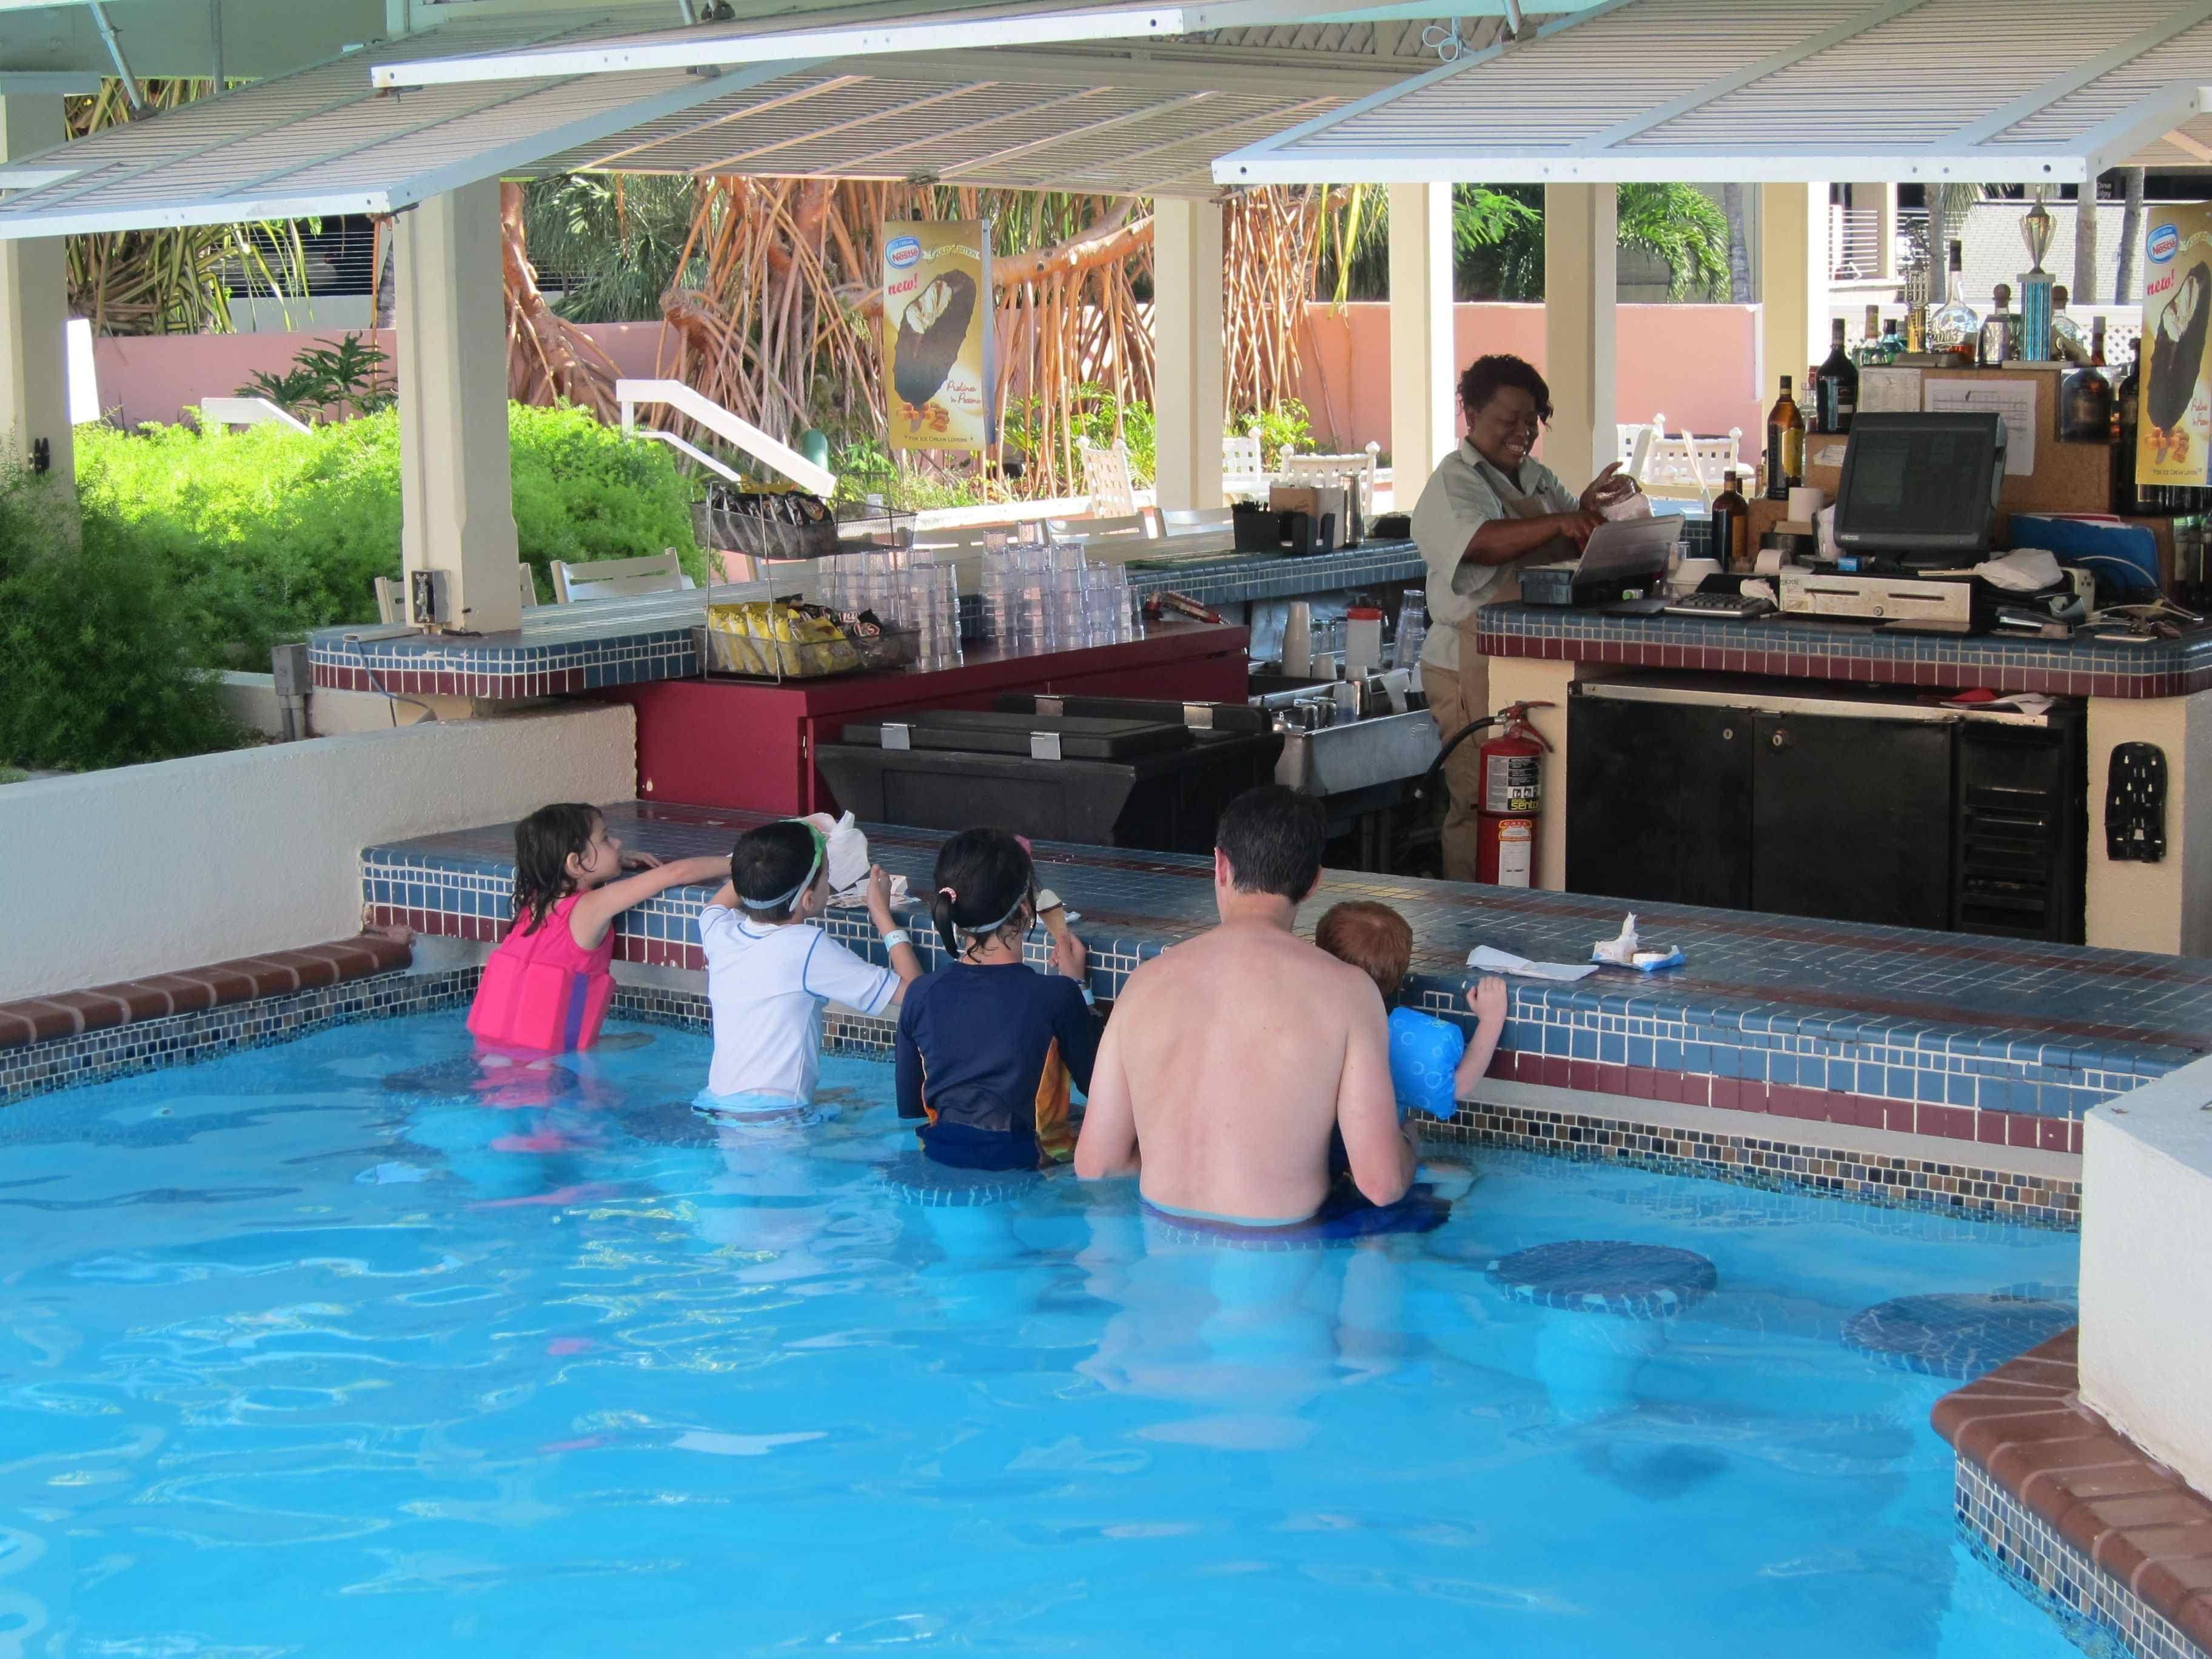 The Swim Up Bar At Comfort Inn U0026 Suites Is Very Popular.